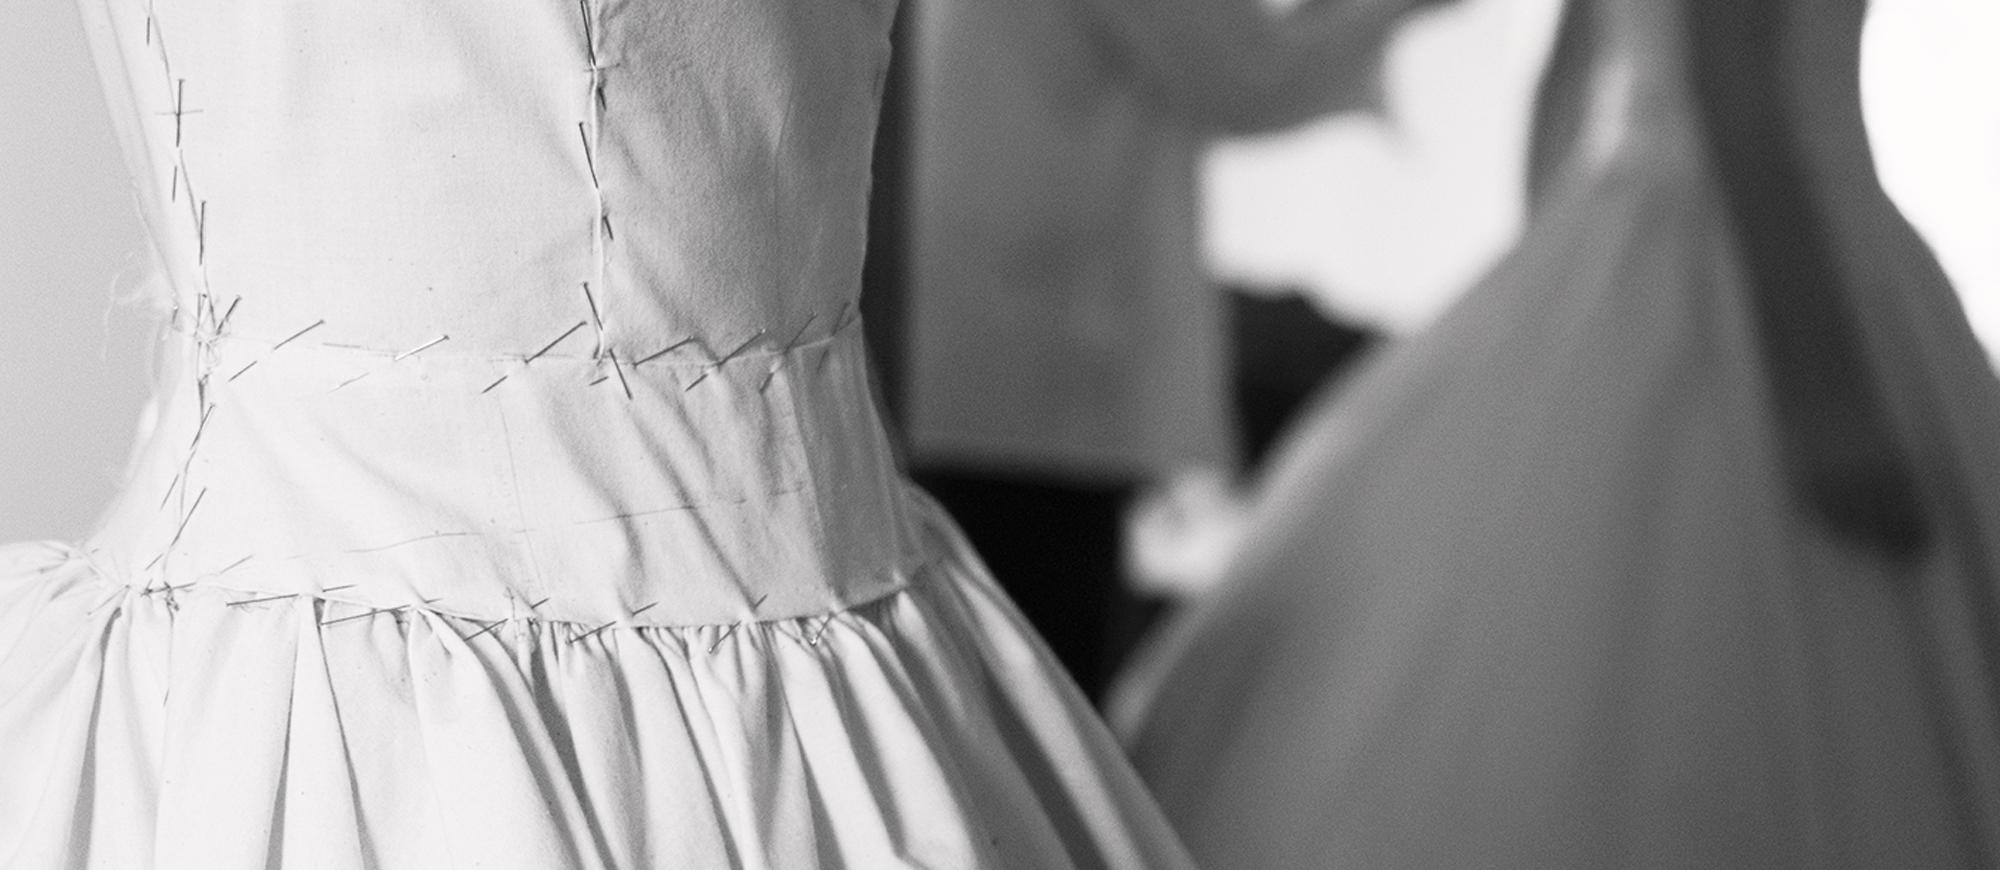 Couturiere robe de mariee perpignan